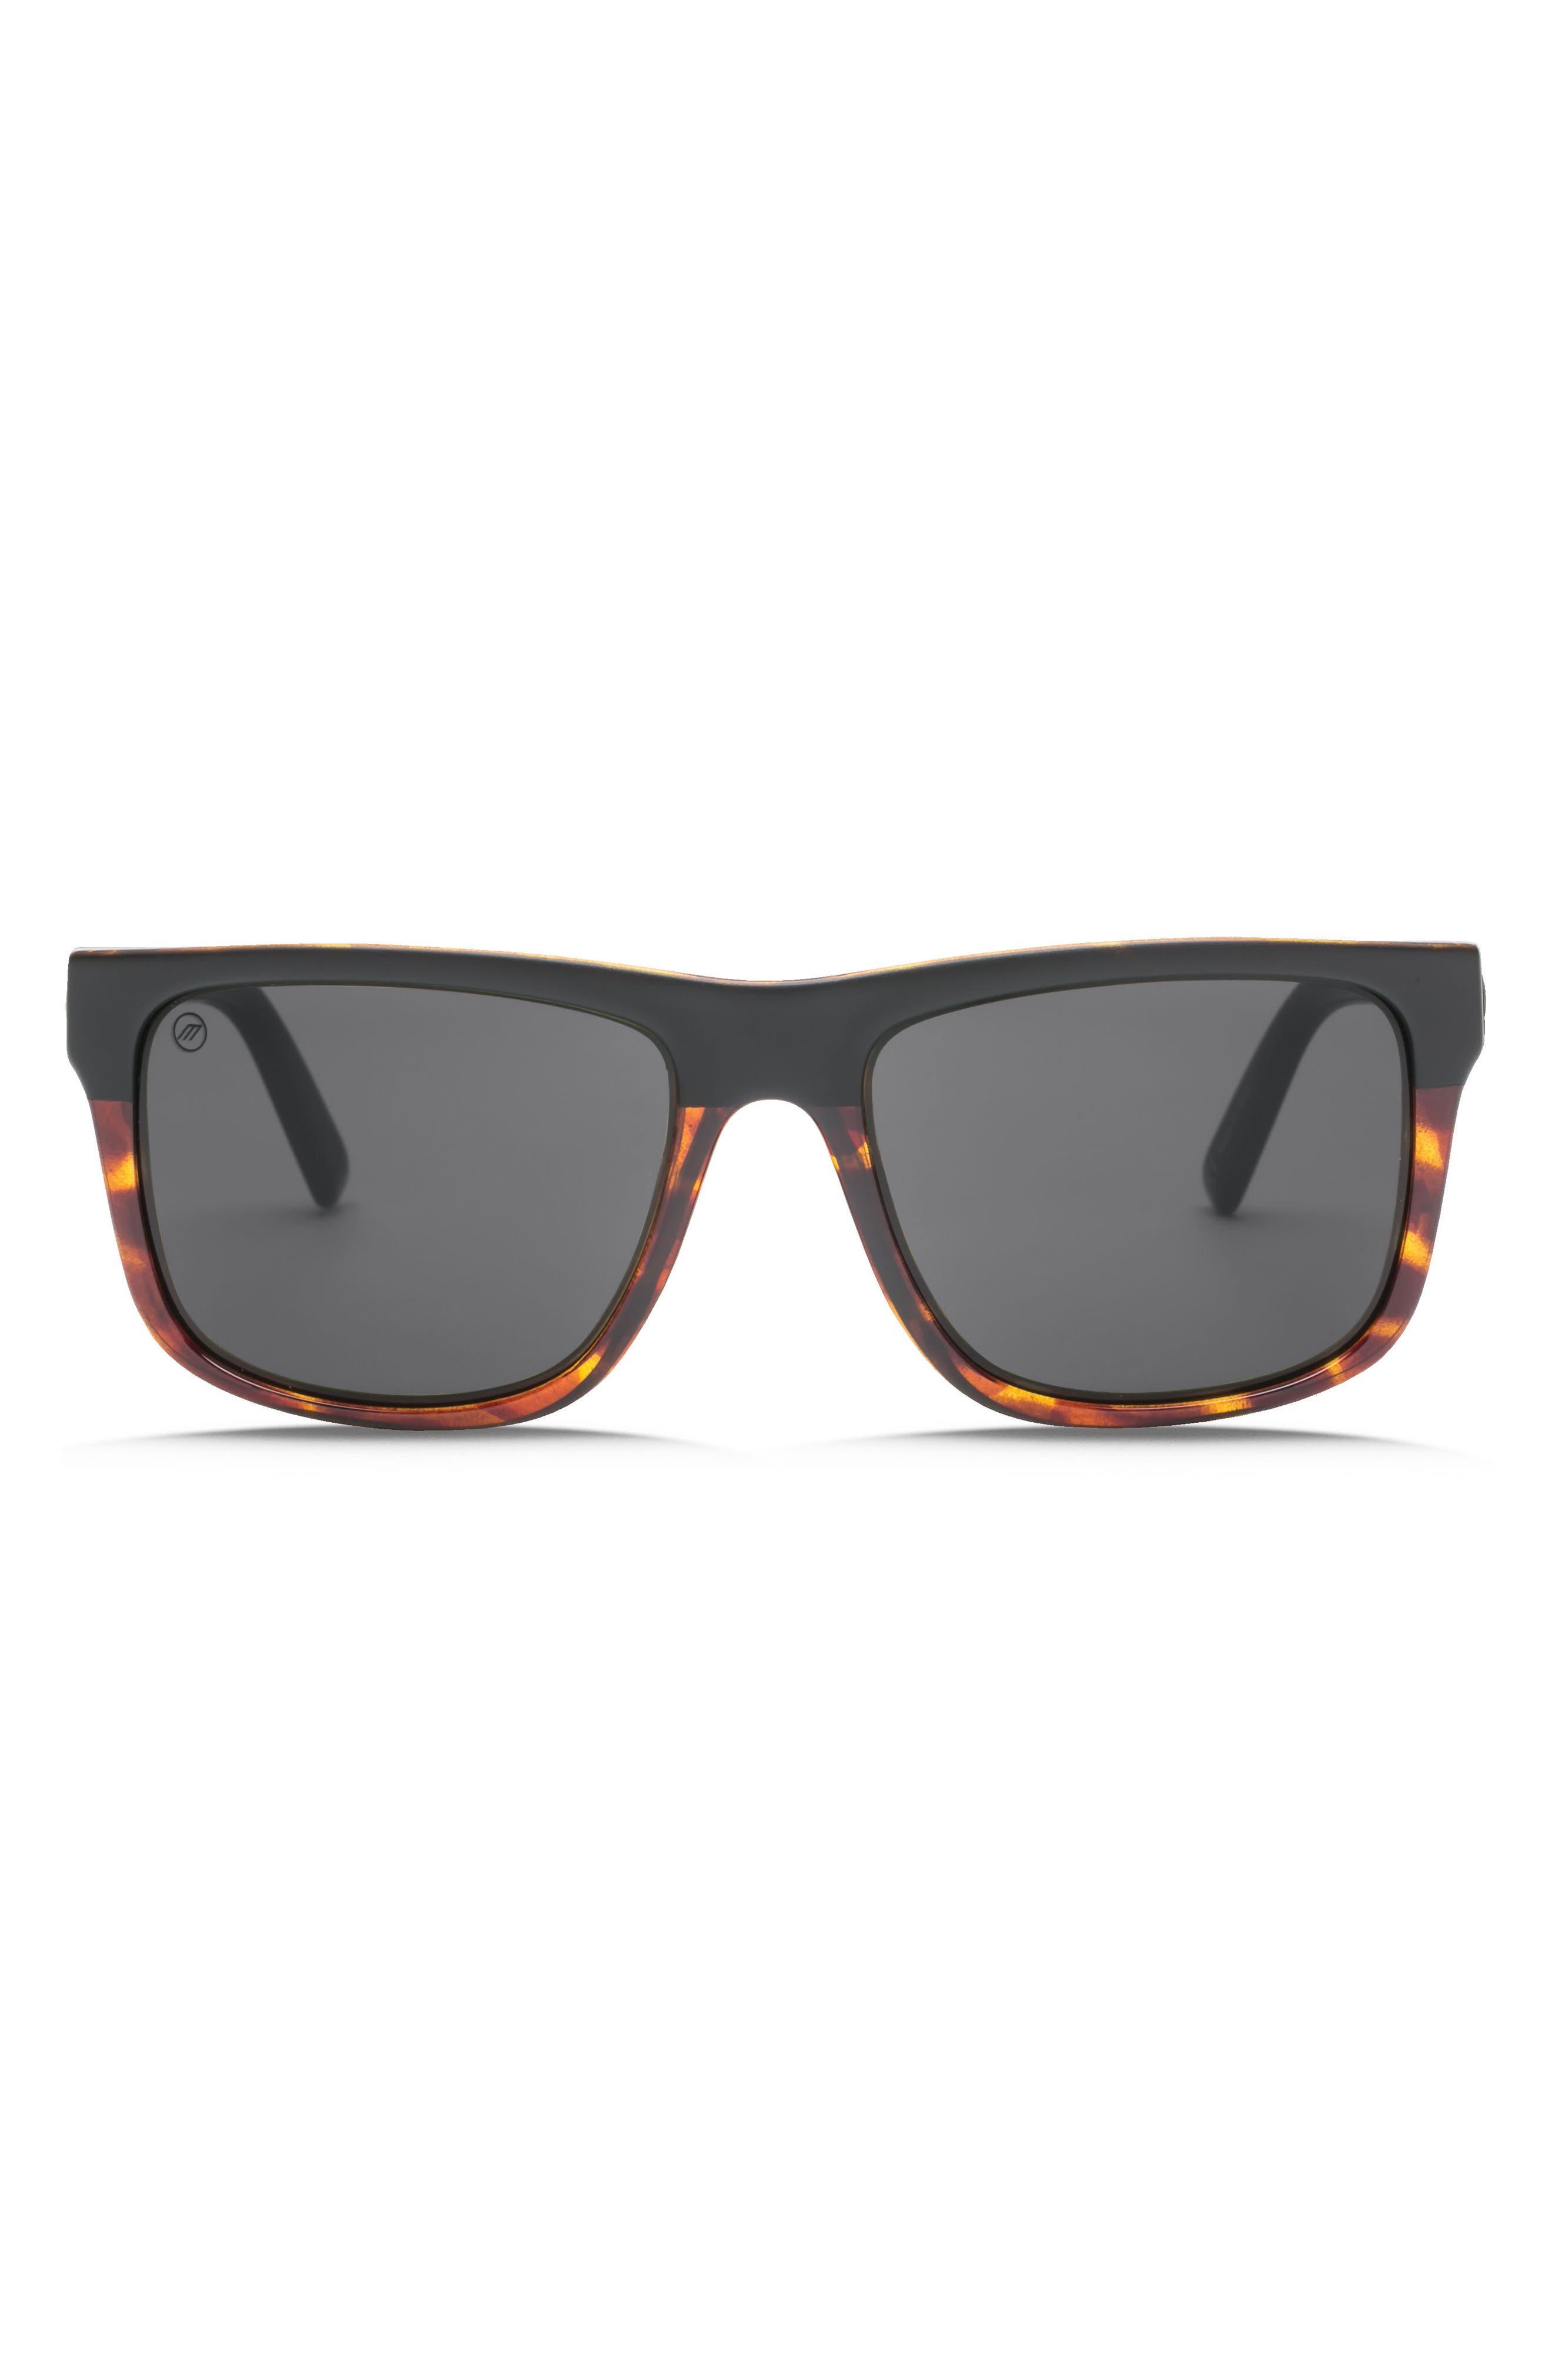 Swingarm XL 59mm Sunglasses,                             Main thumbnail 1, color,                             Darkside Tortoise/ Grey